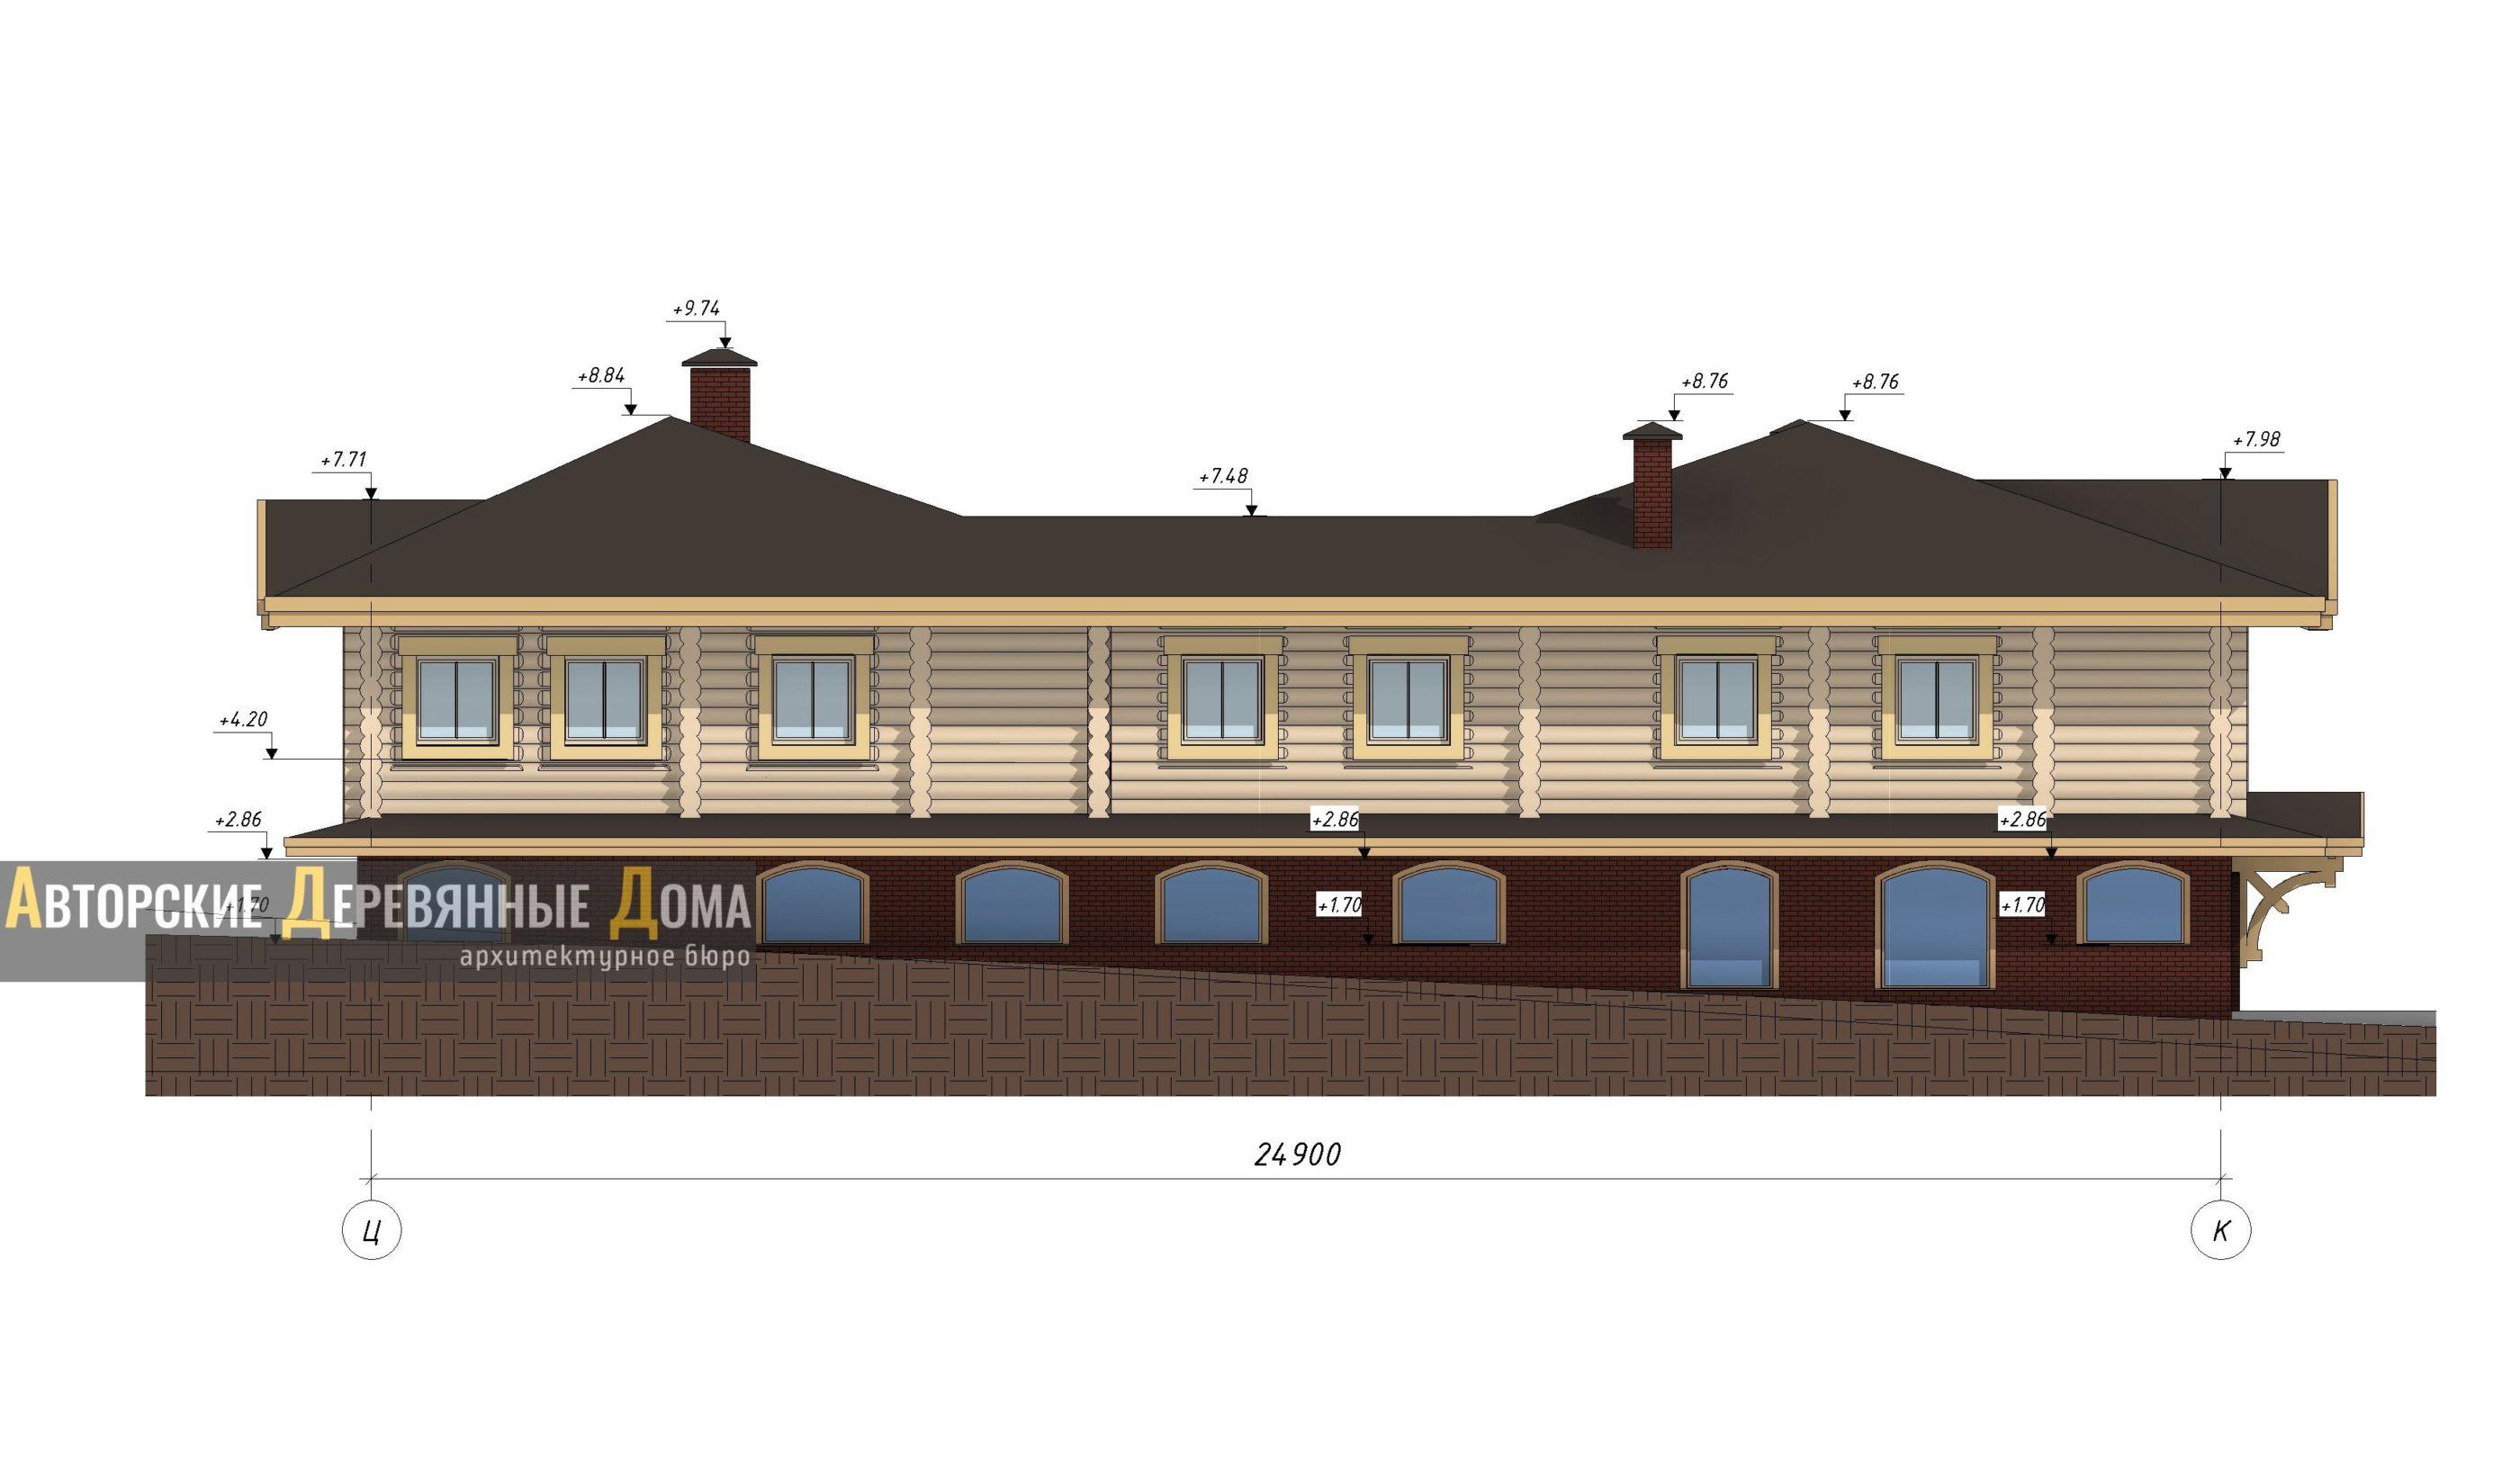 проект строительства центра реабилитации. Фасад 5